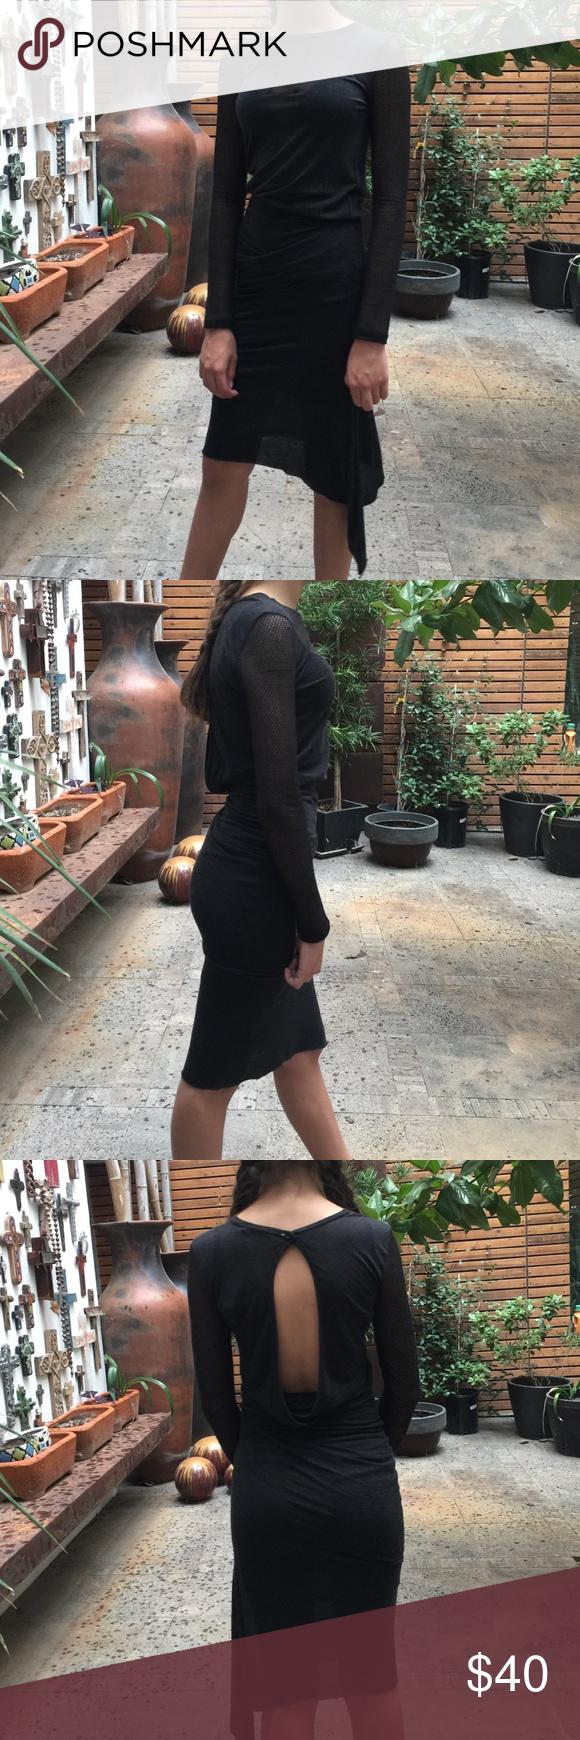 Love zooey grayish black dress bodycon dress and th